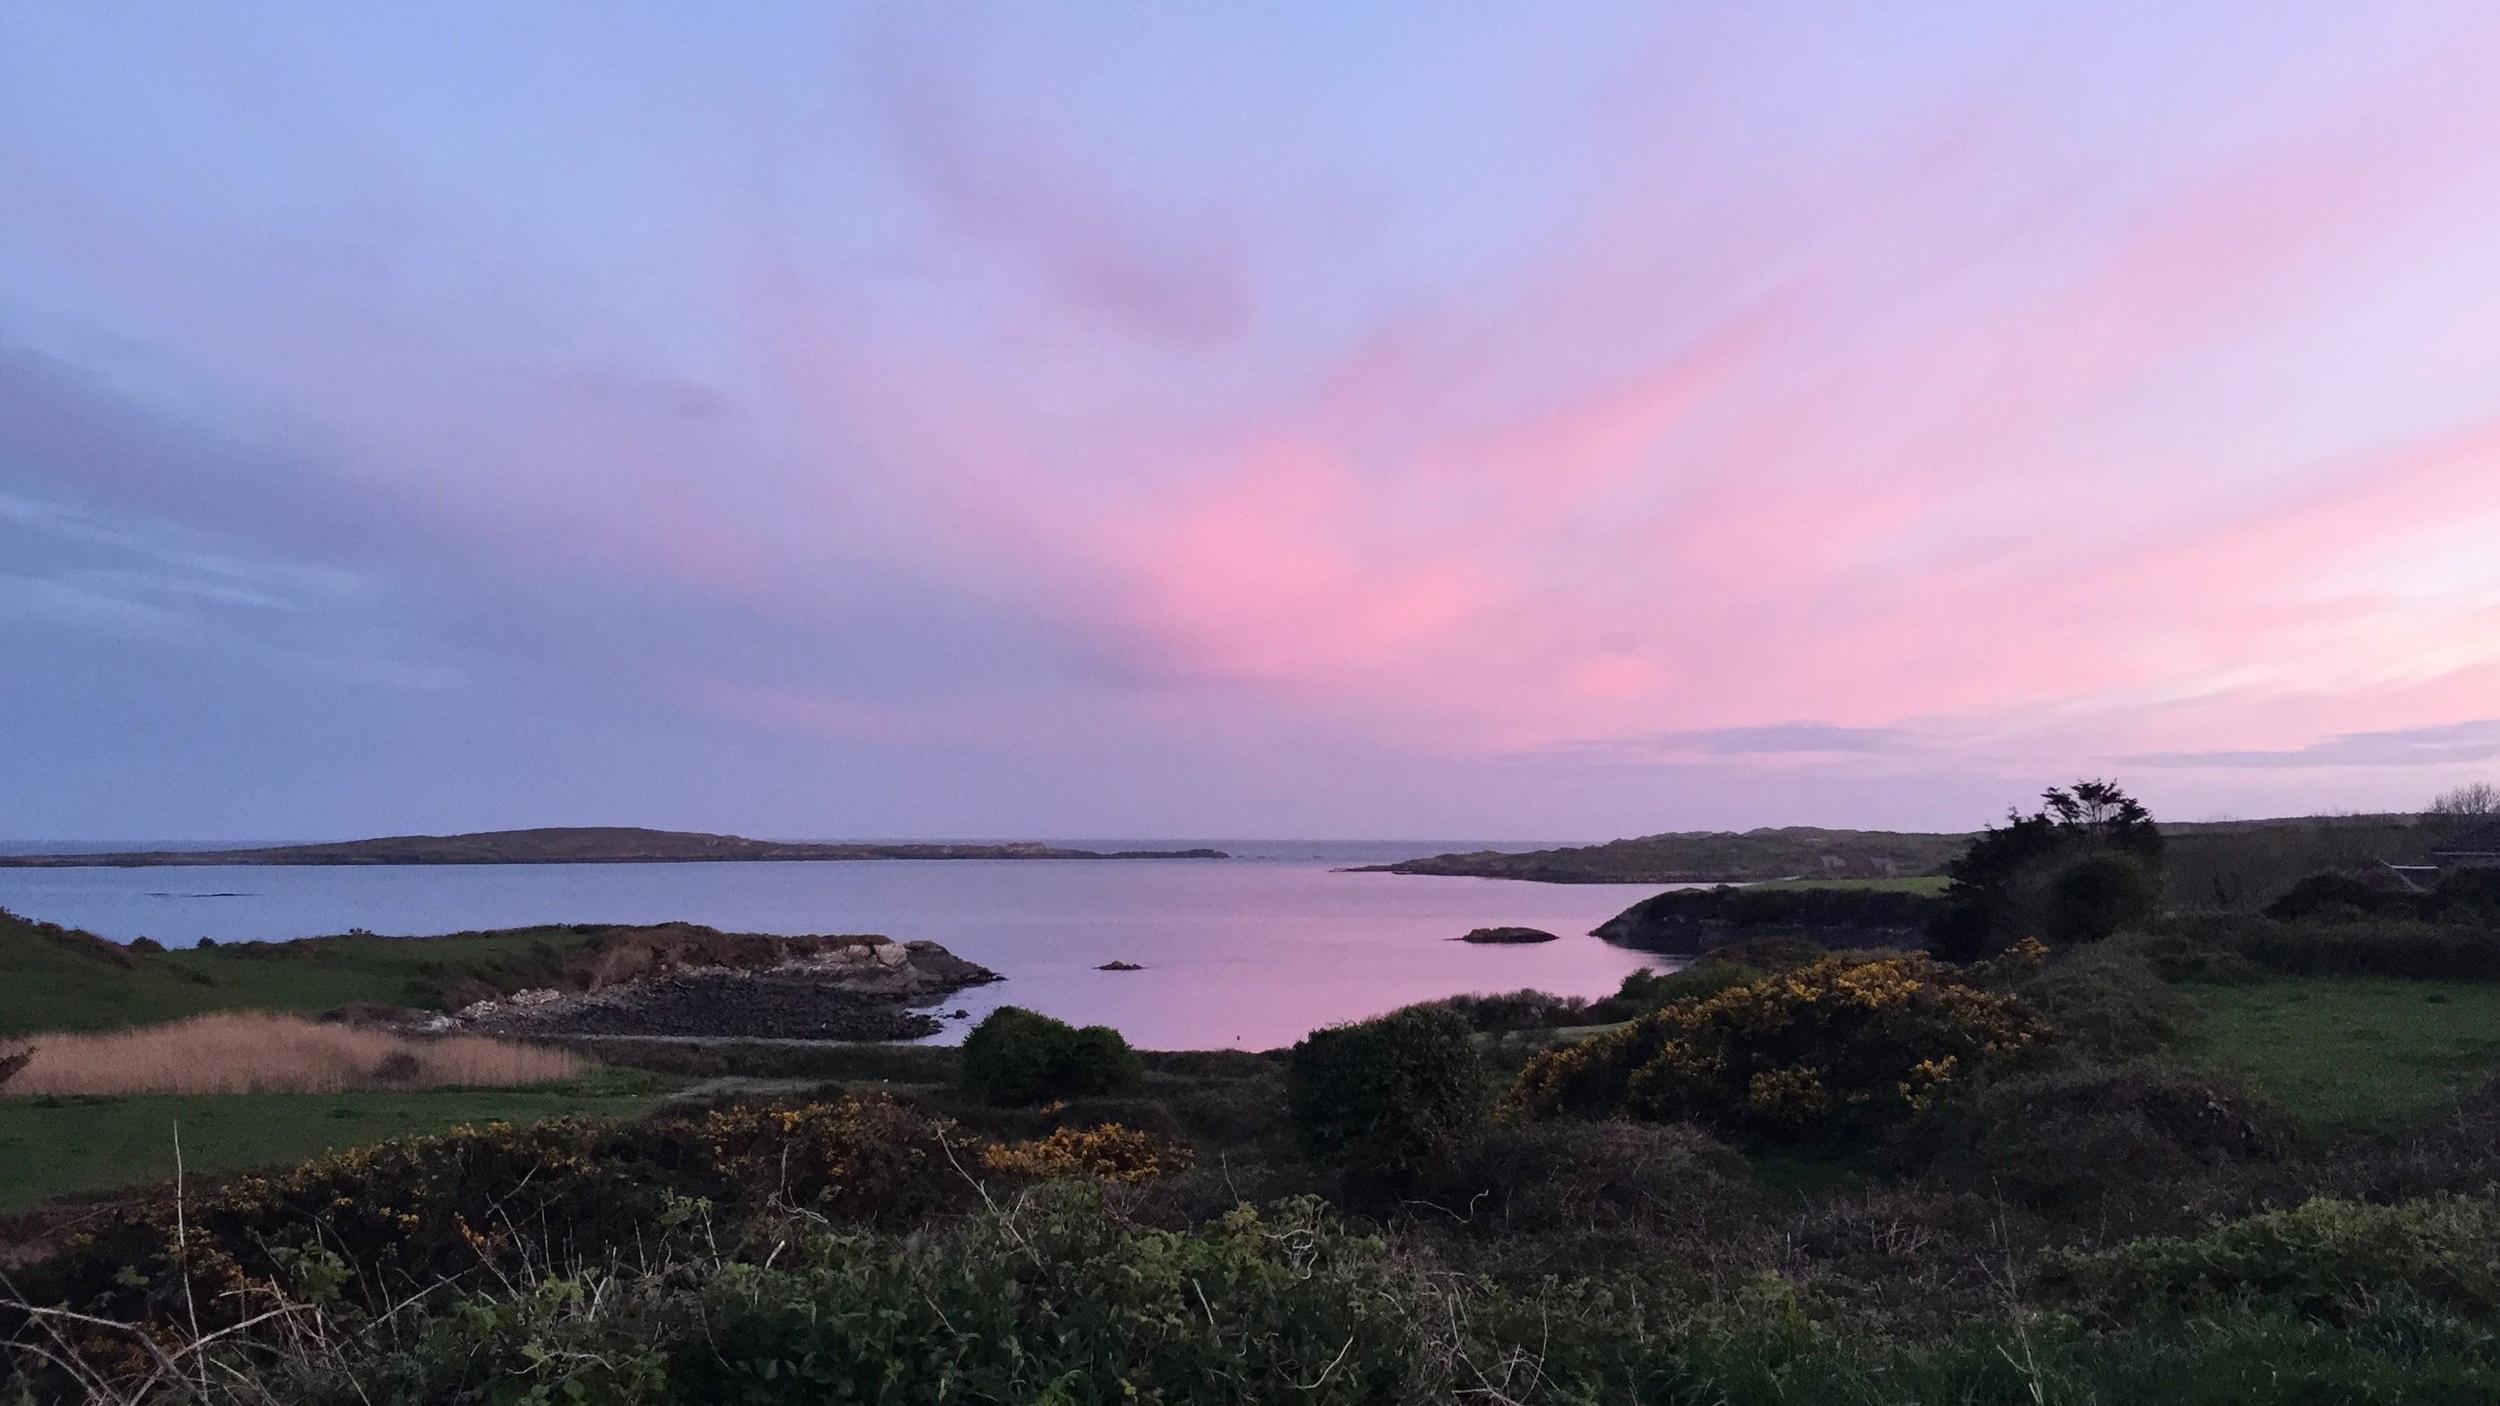 tamsin-blackbourn-sunset-crewe-bay.jpg